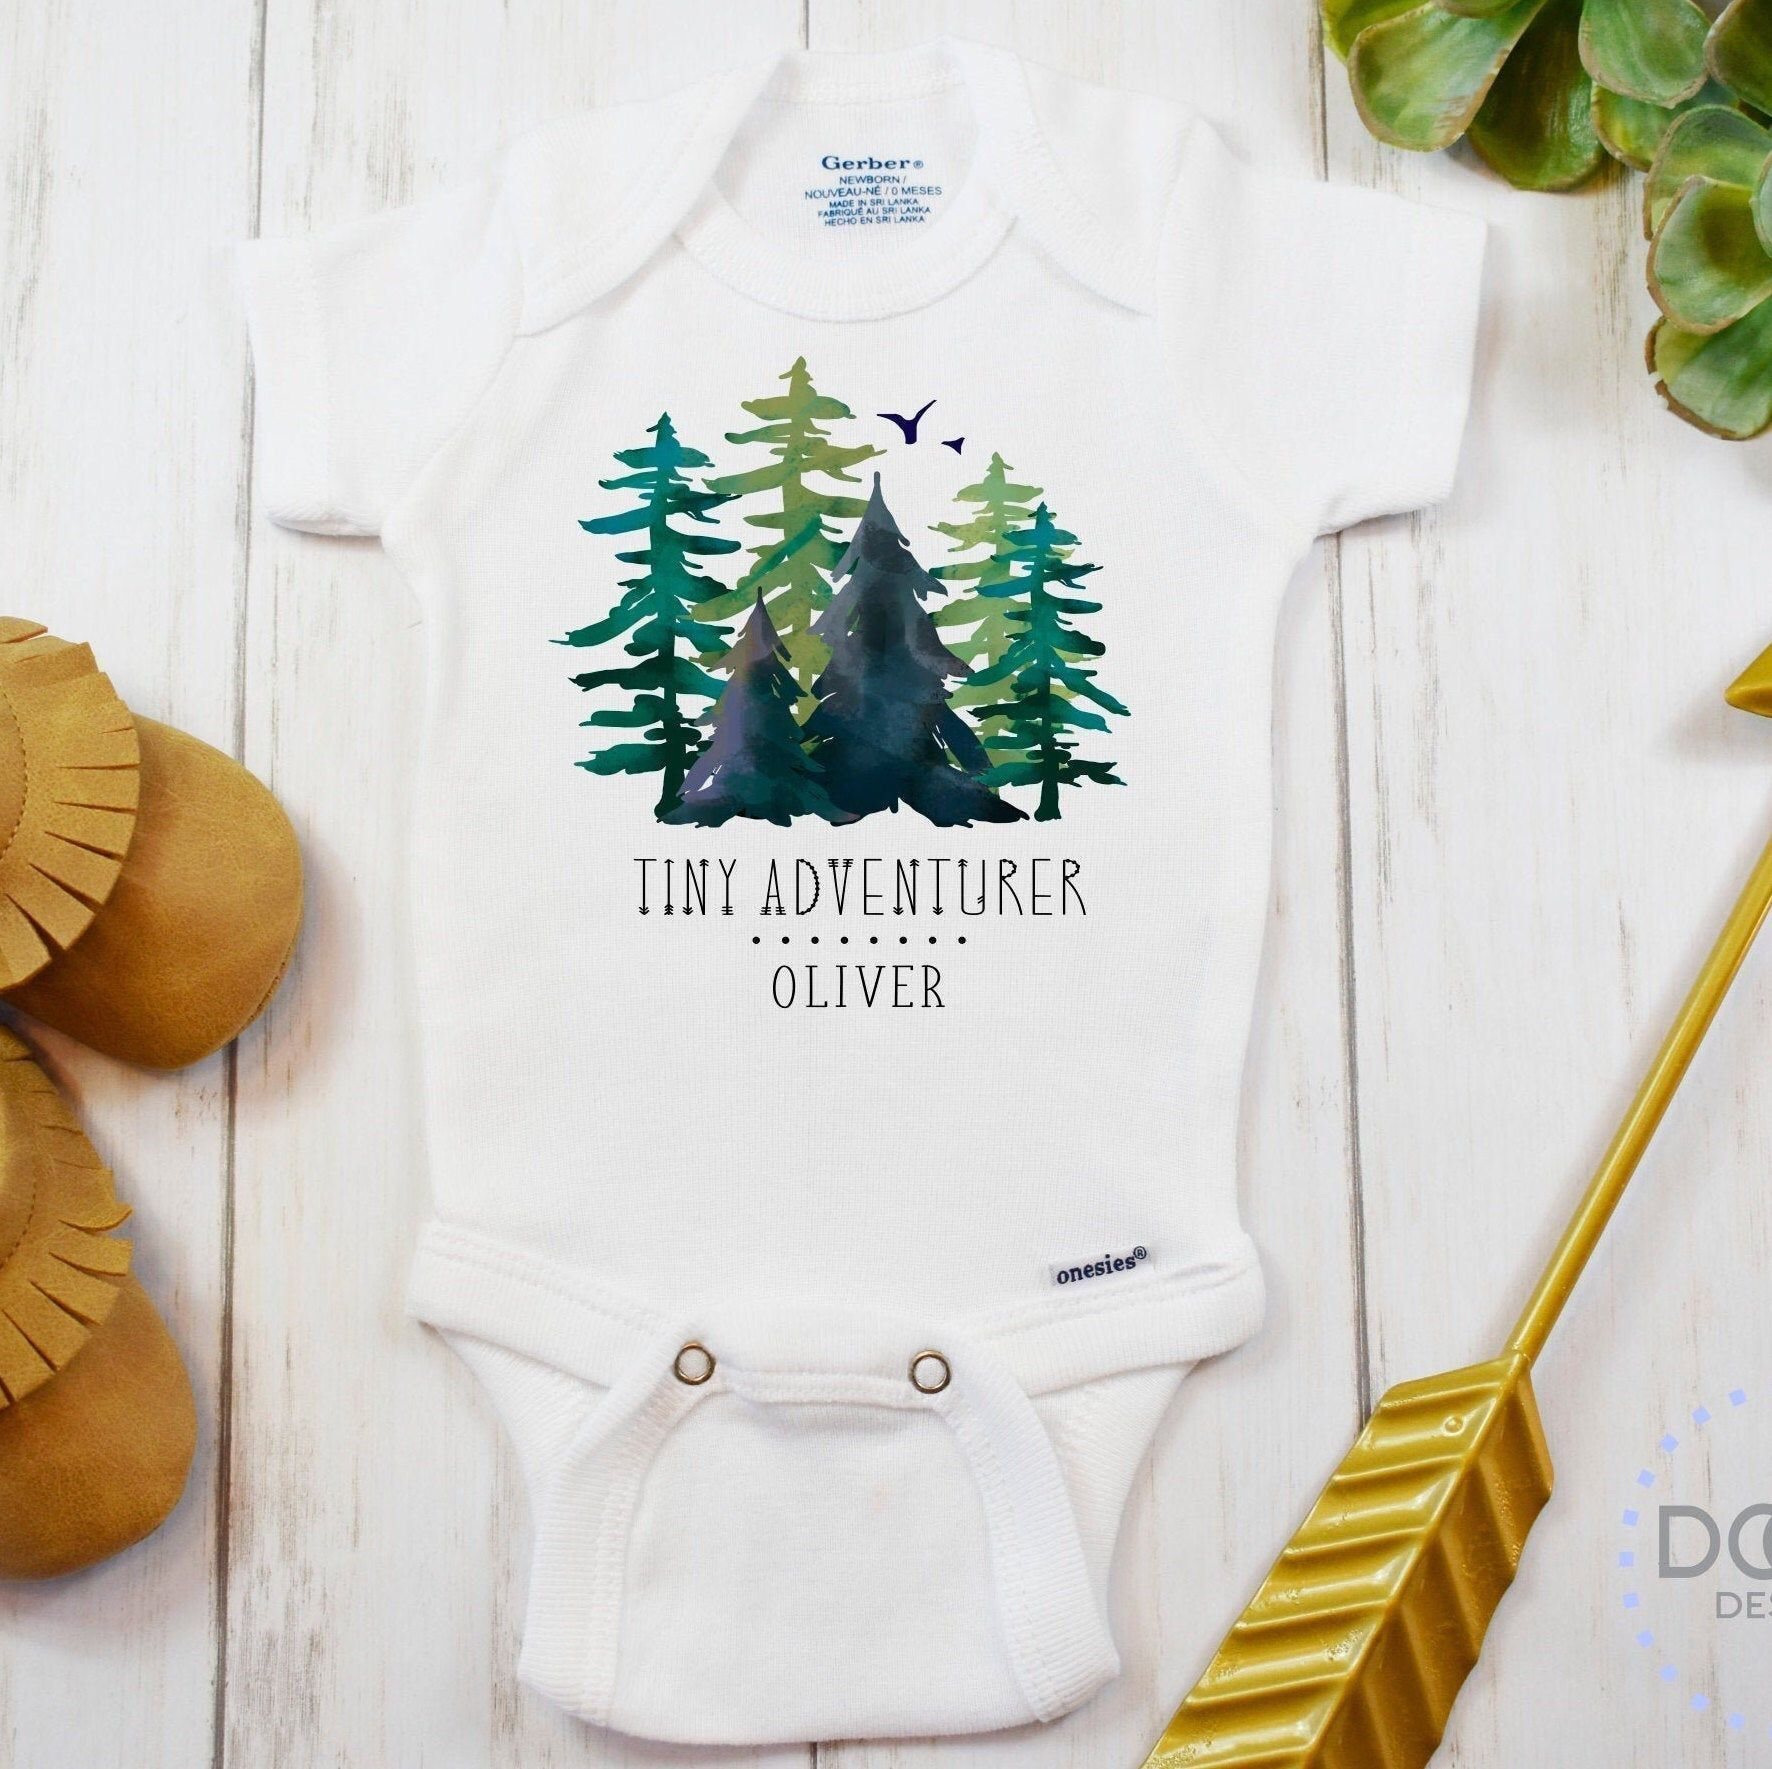 Explorer Baby Shower Mountain Baby Adventure Baby Outfit Explorer Baby Shower Little Explorer Baby Outfit Explorer Baby Boy Outfit